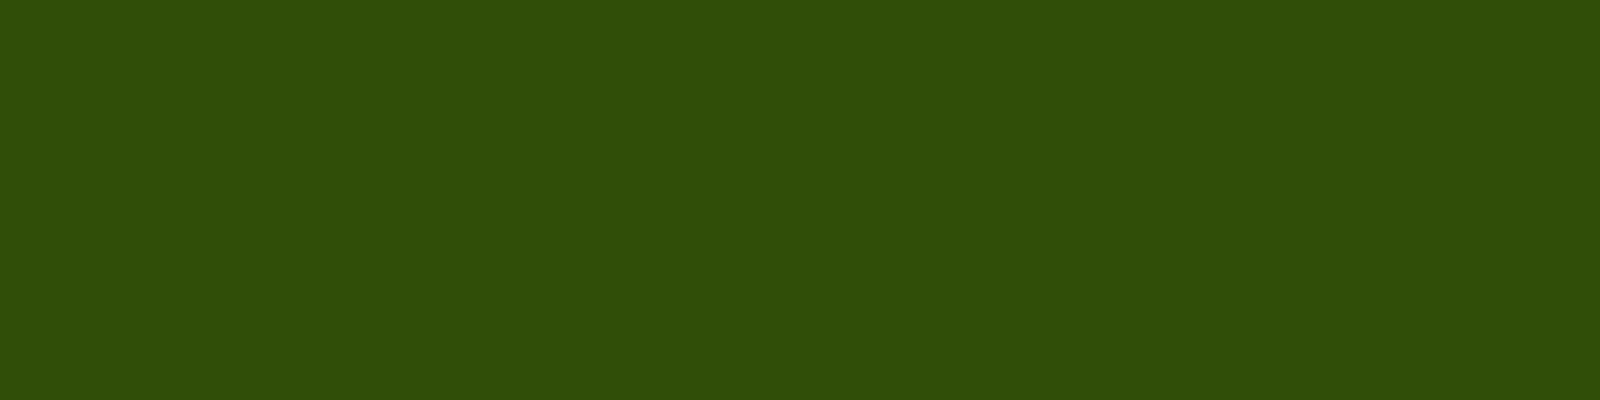 cropped-sfondoverde.jpg